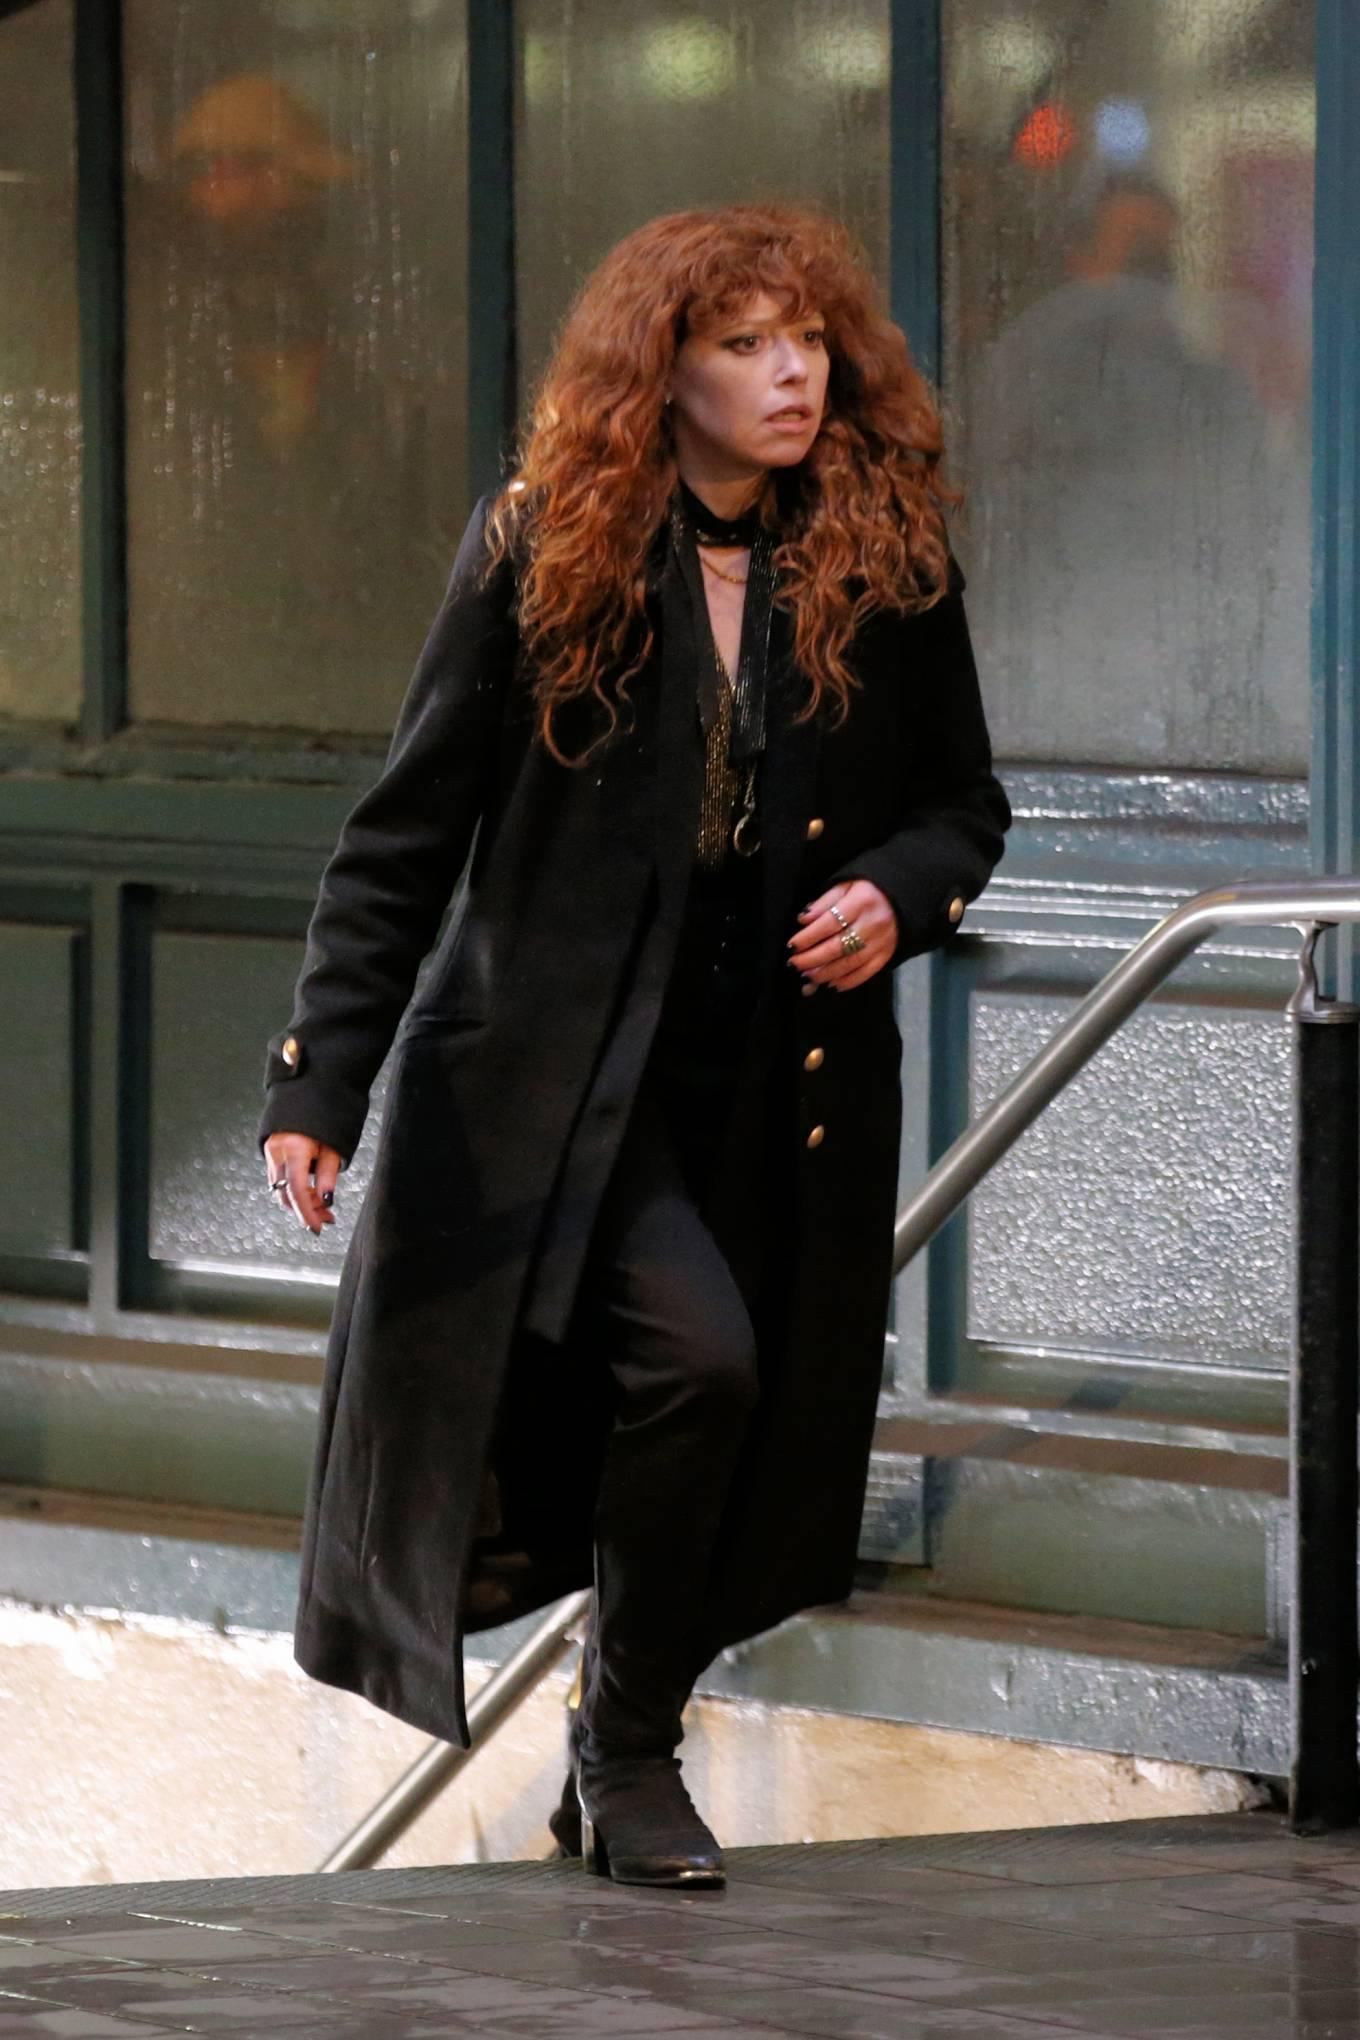 Natasha Lyonne - 'Russian Doll' night scene set at the Astor Place in New York